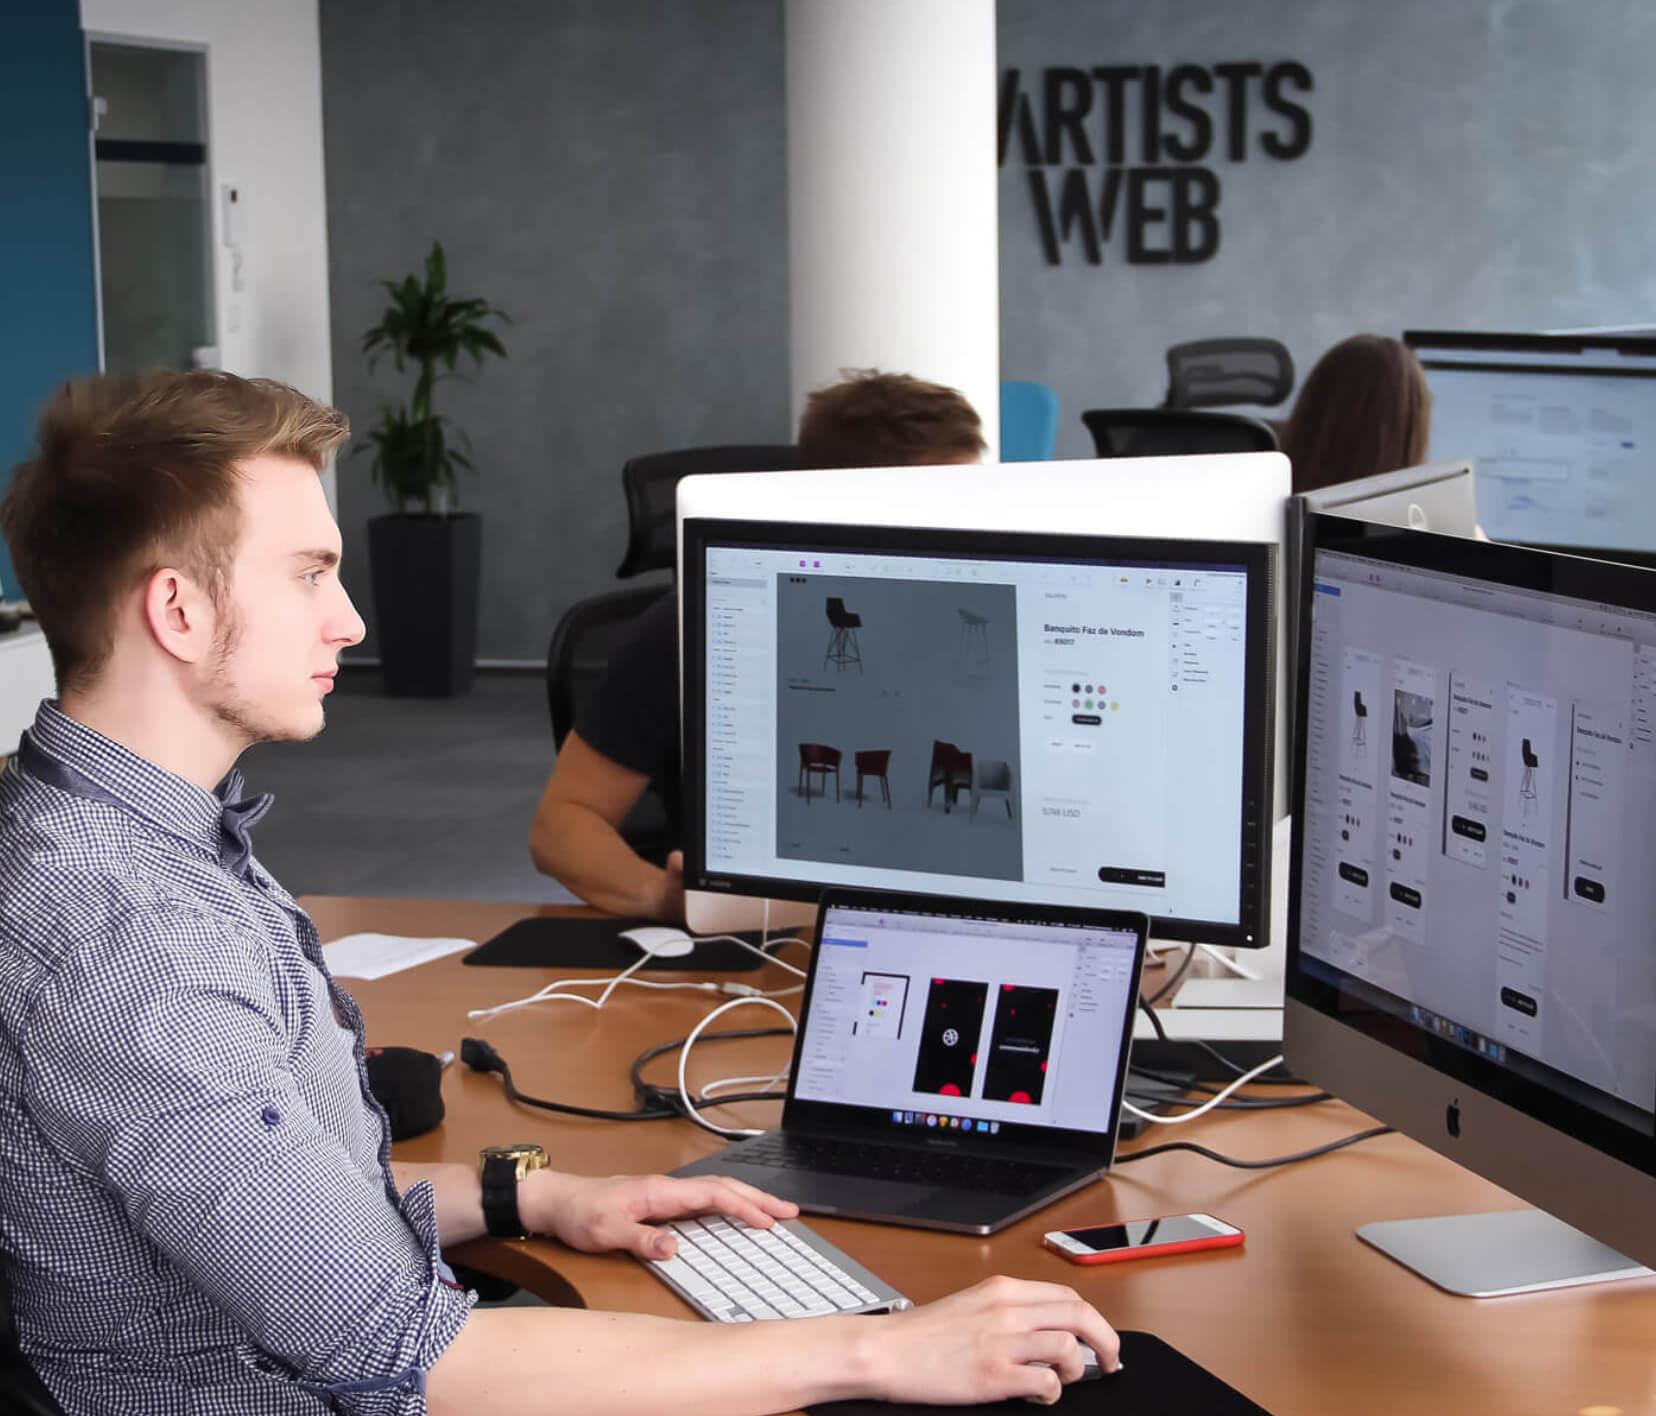 artistsweb-london-webdesignteam